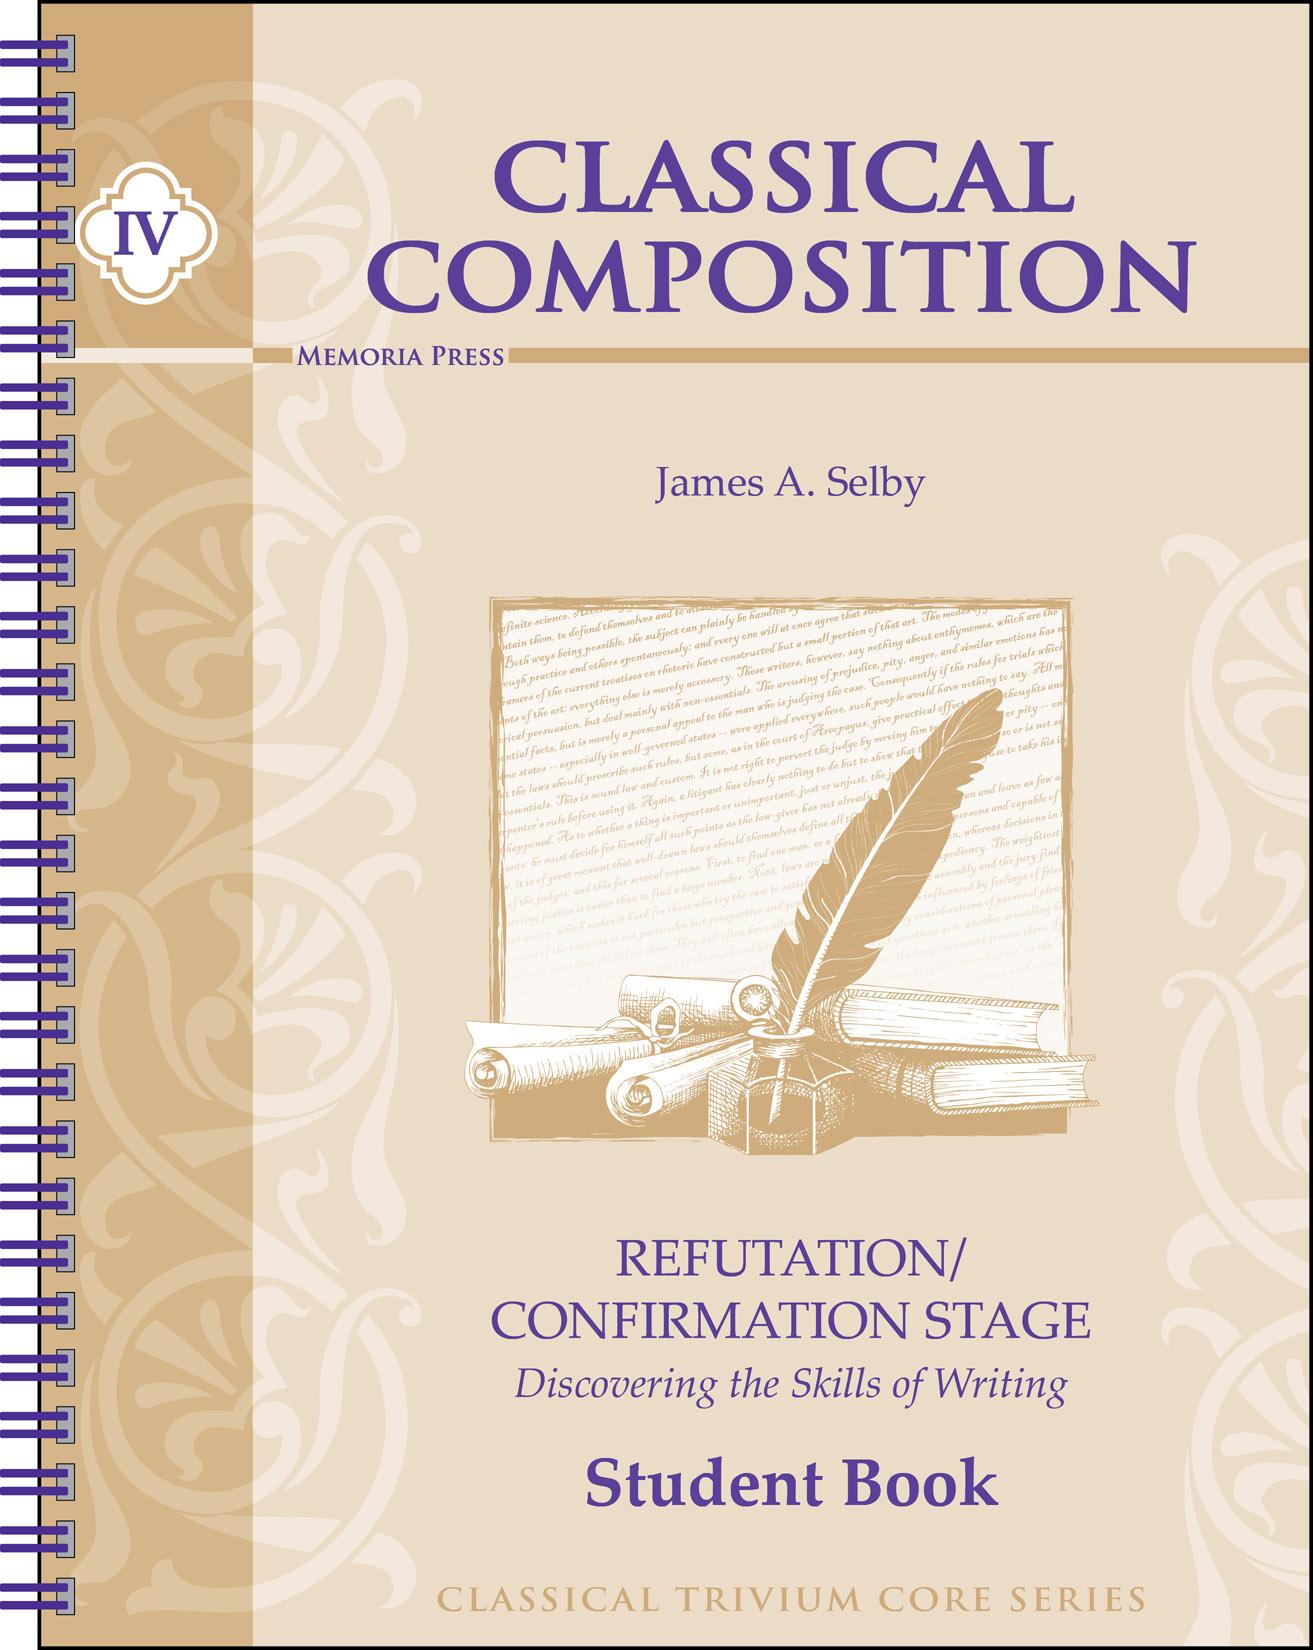 confirmation and refutation essay